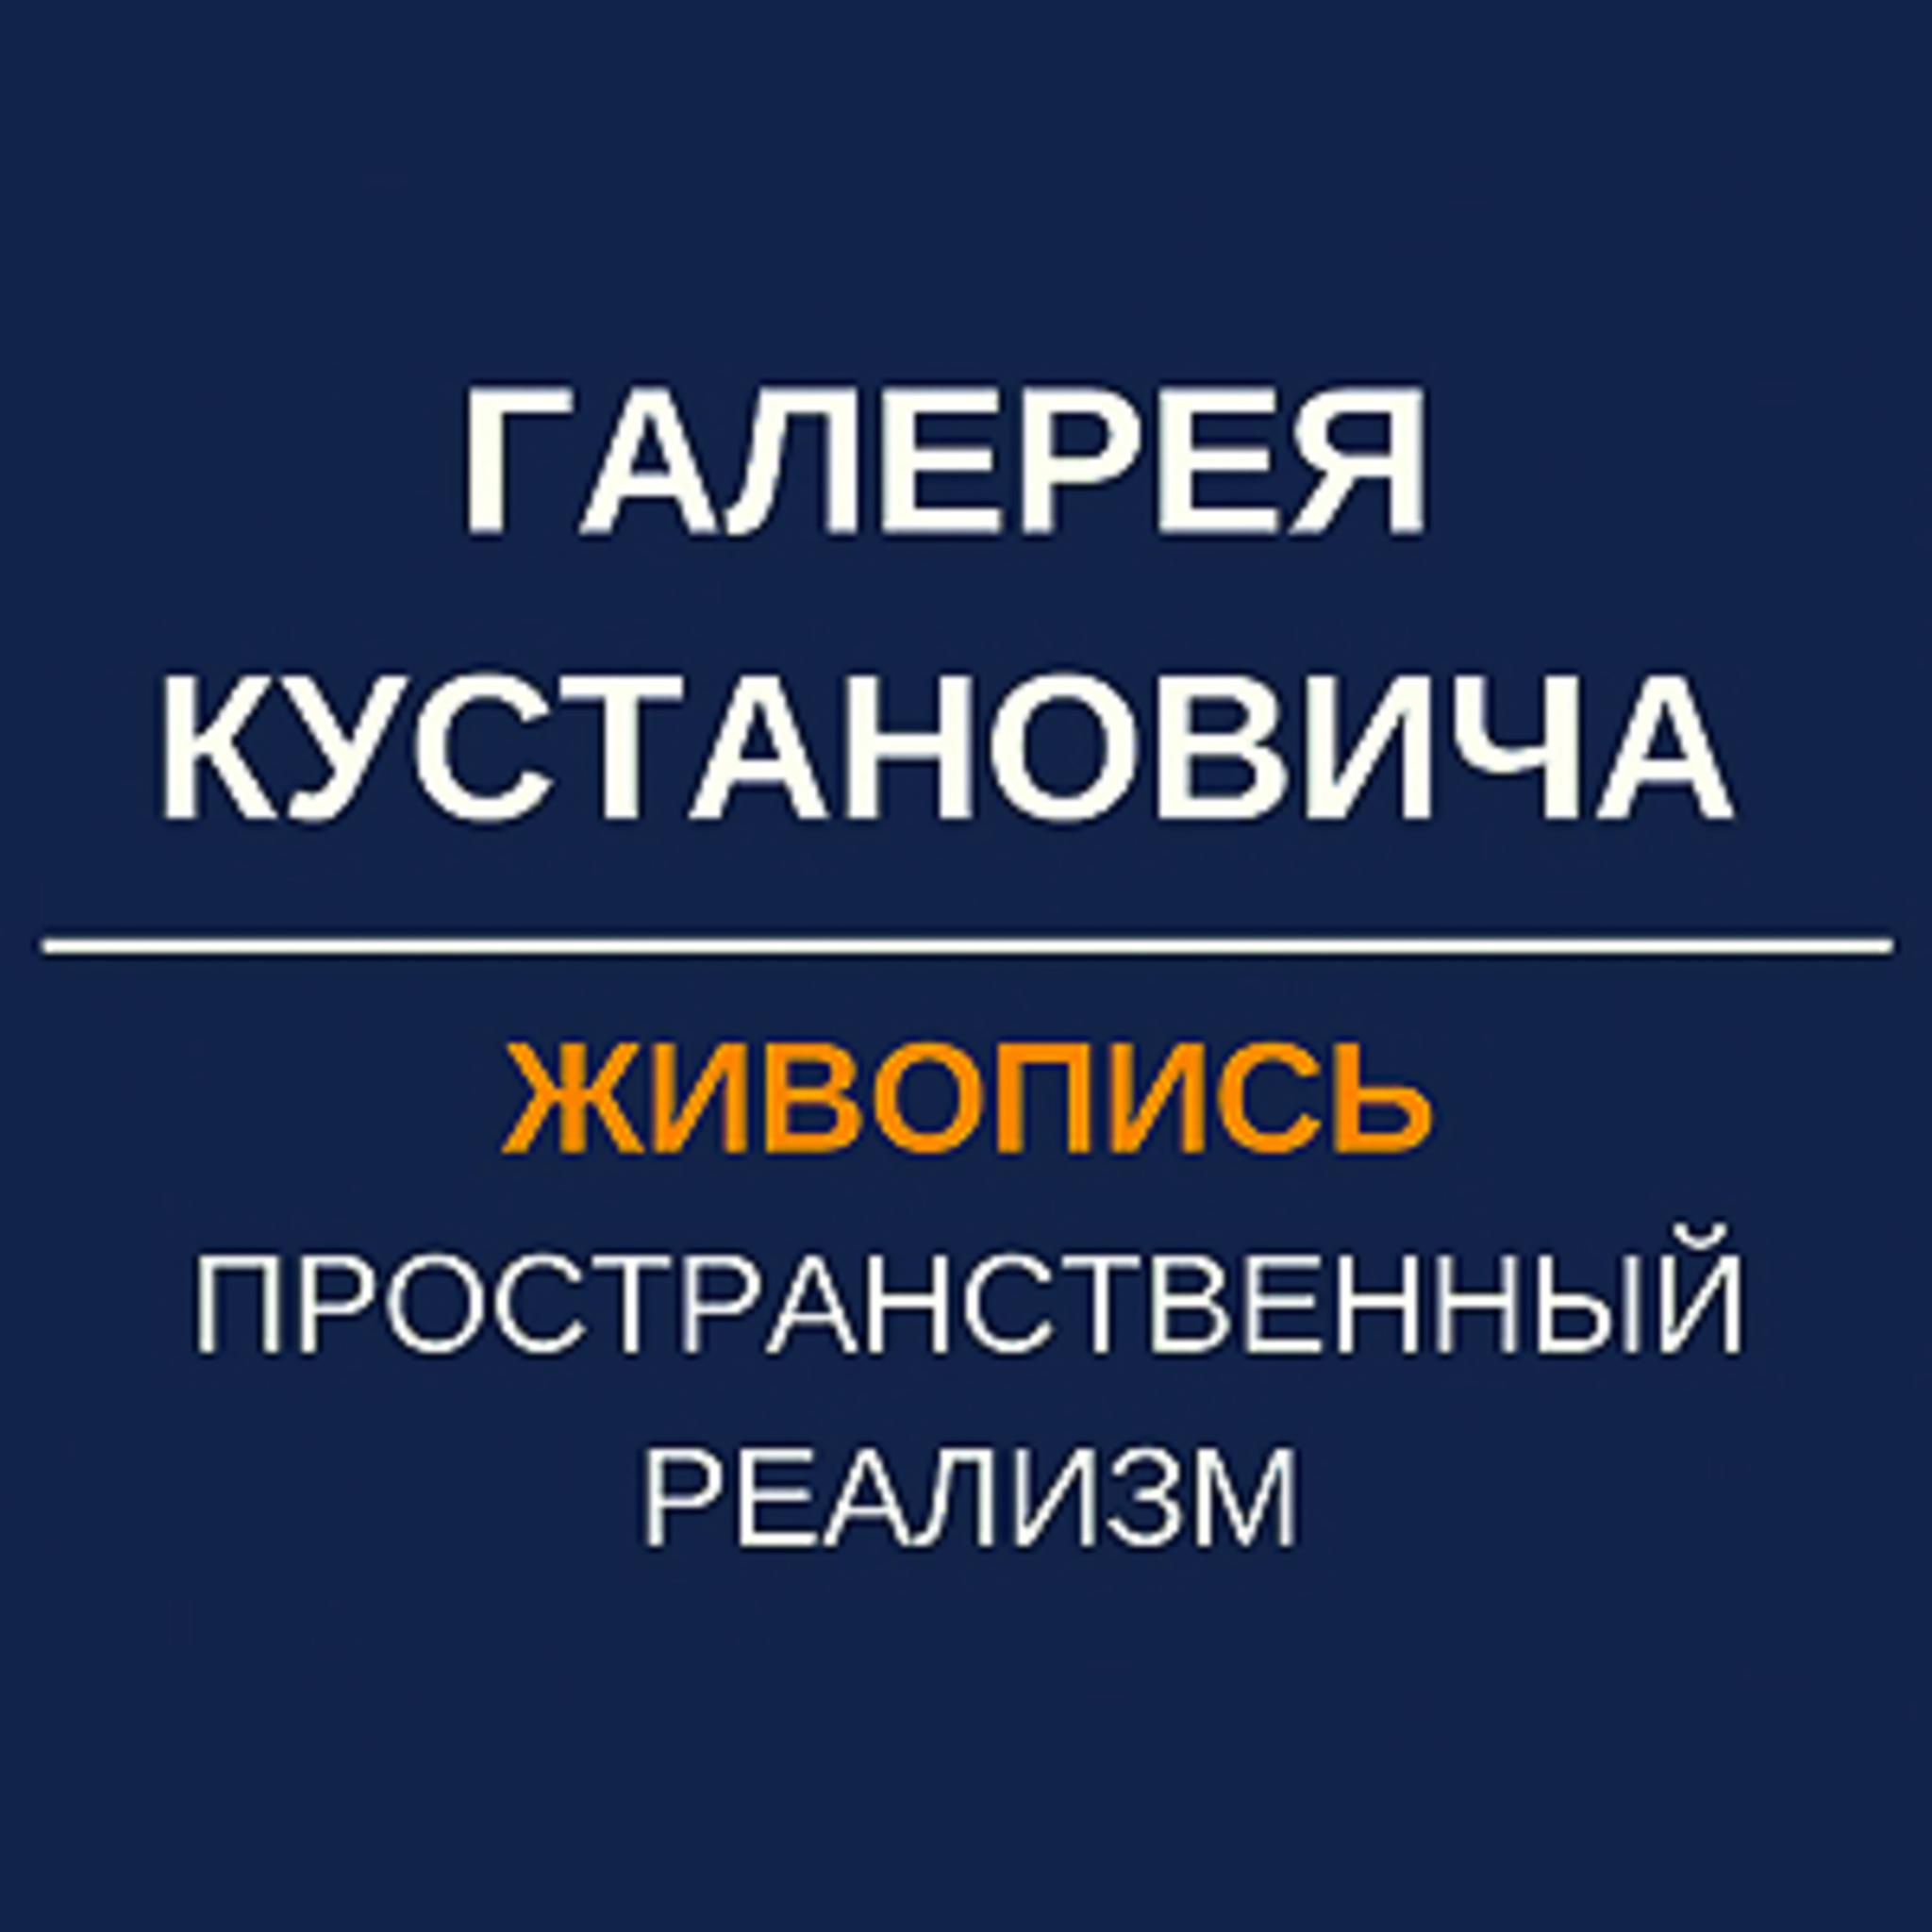 Галерея художника Дмитрия Кустановича